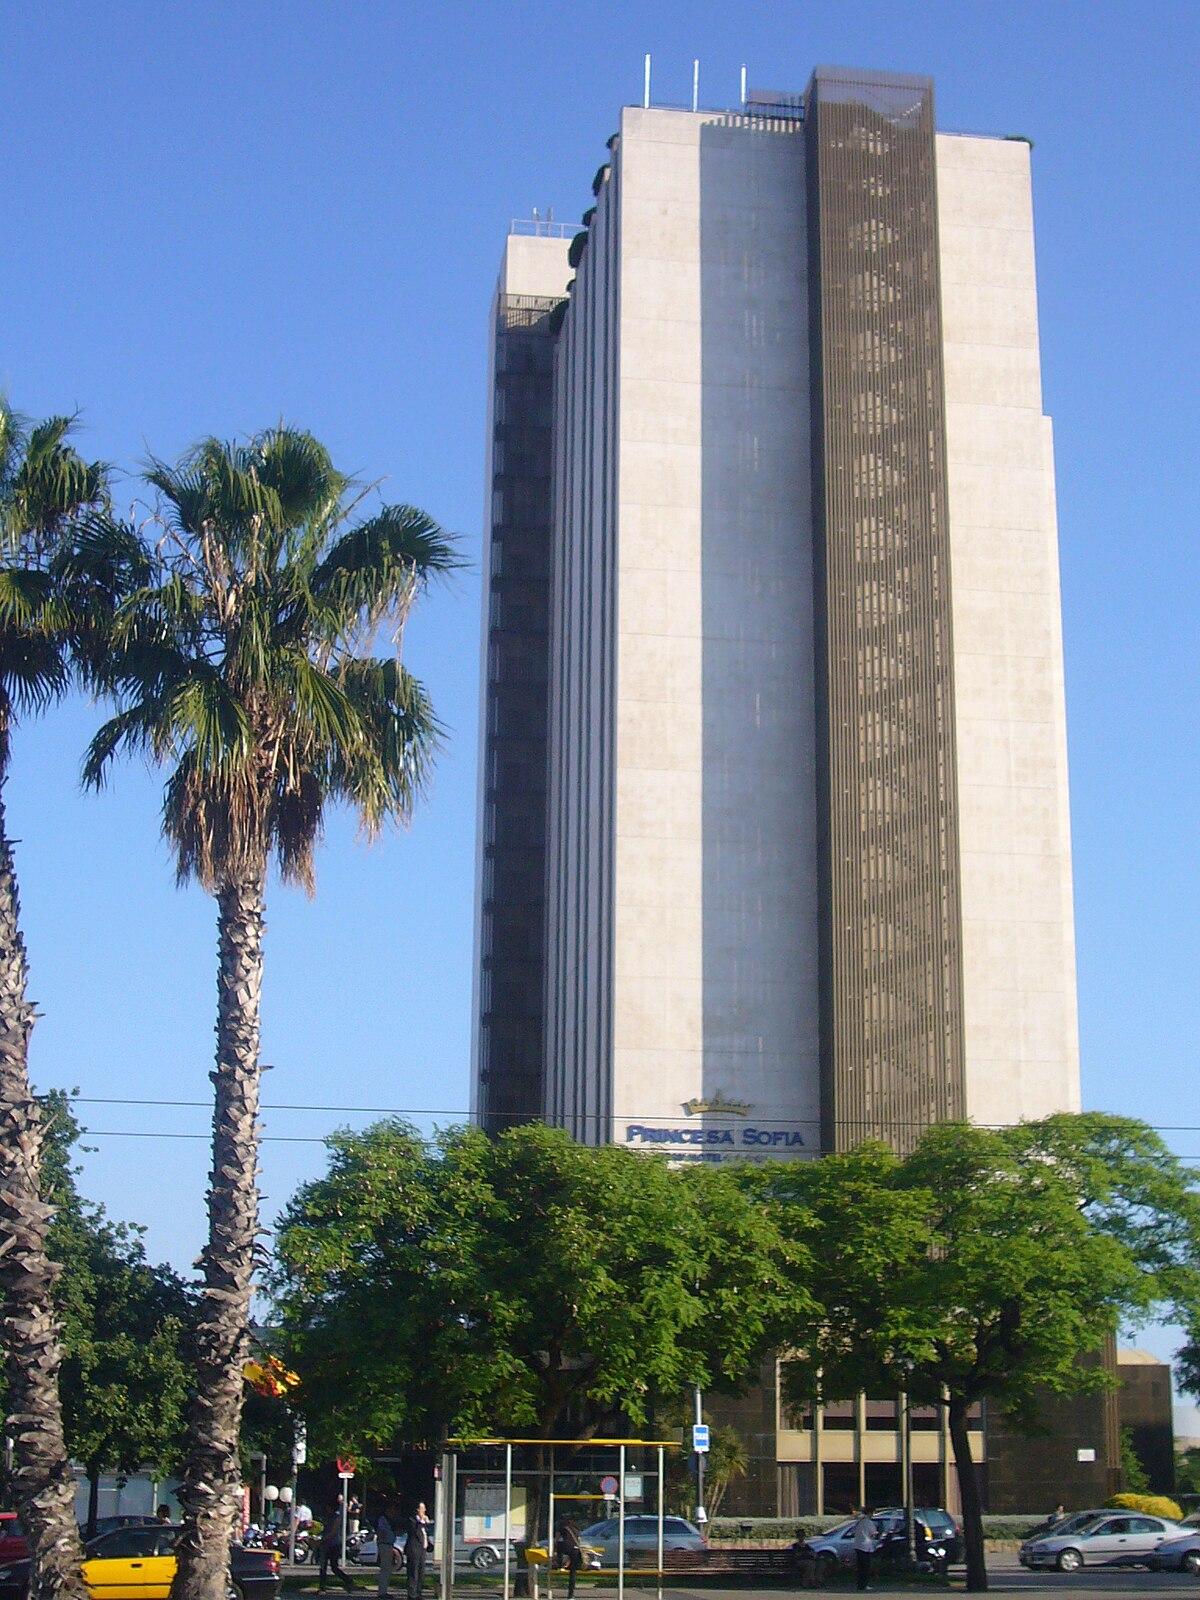 Hotel princesa sofia wikipedia for Ave hotel barcelona madrid